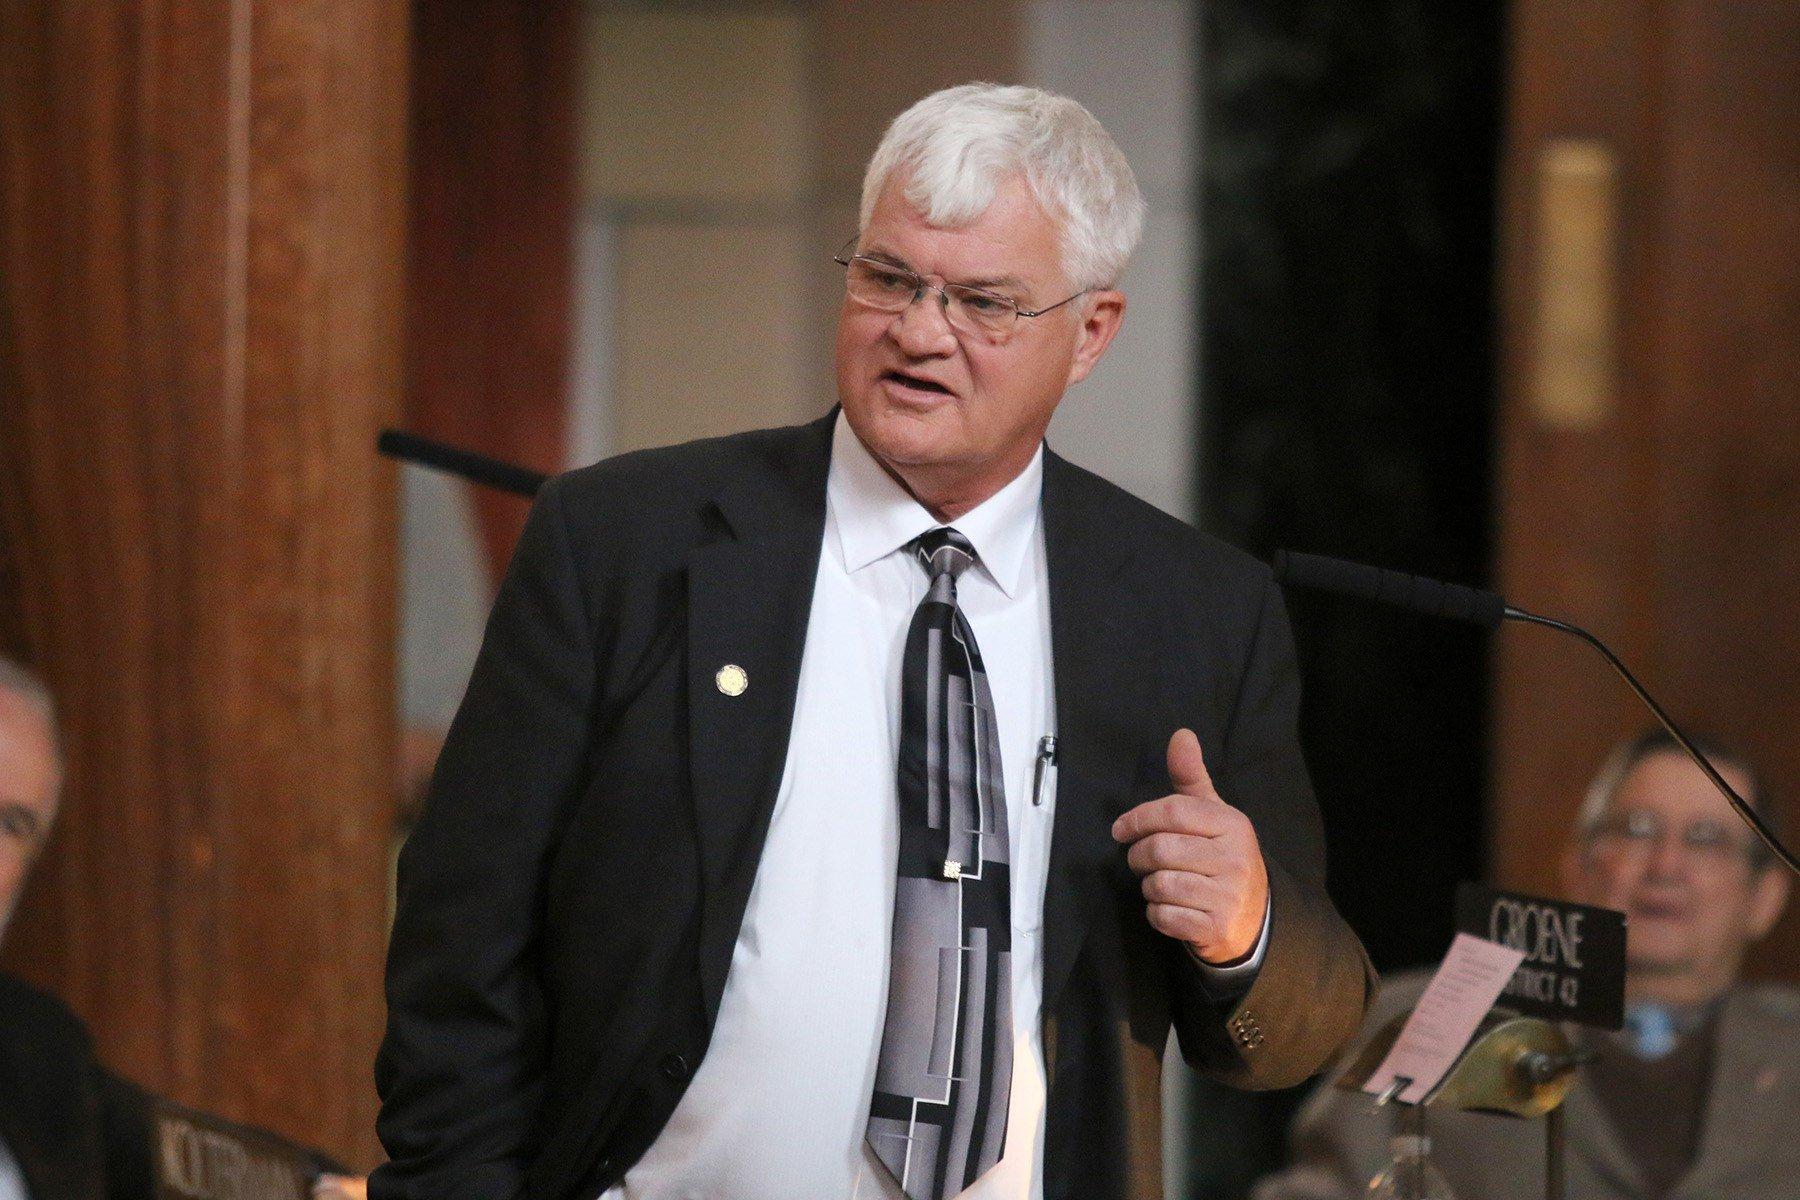 Nebraska lawmakers approve $26M corporate income tax cut